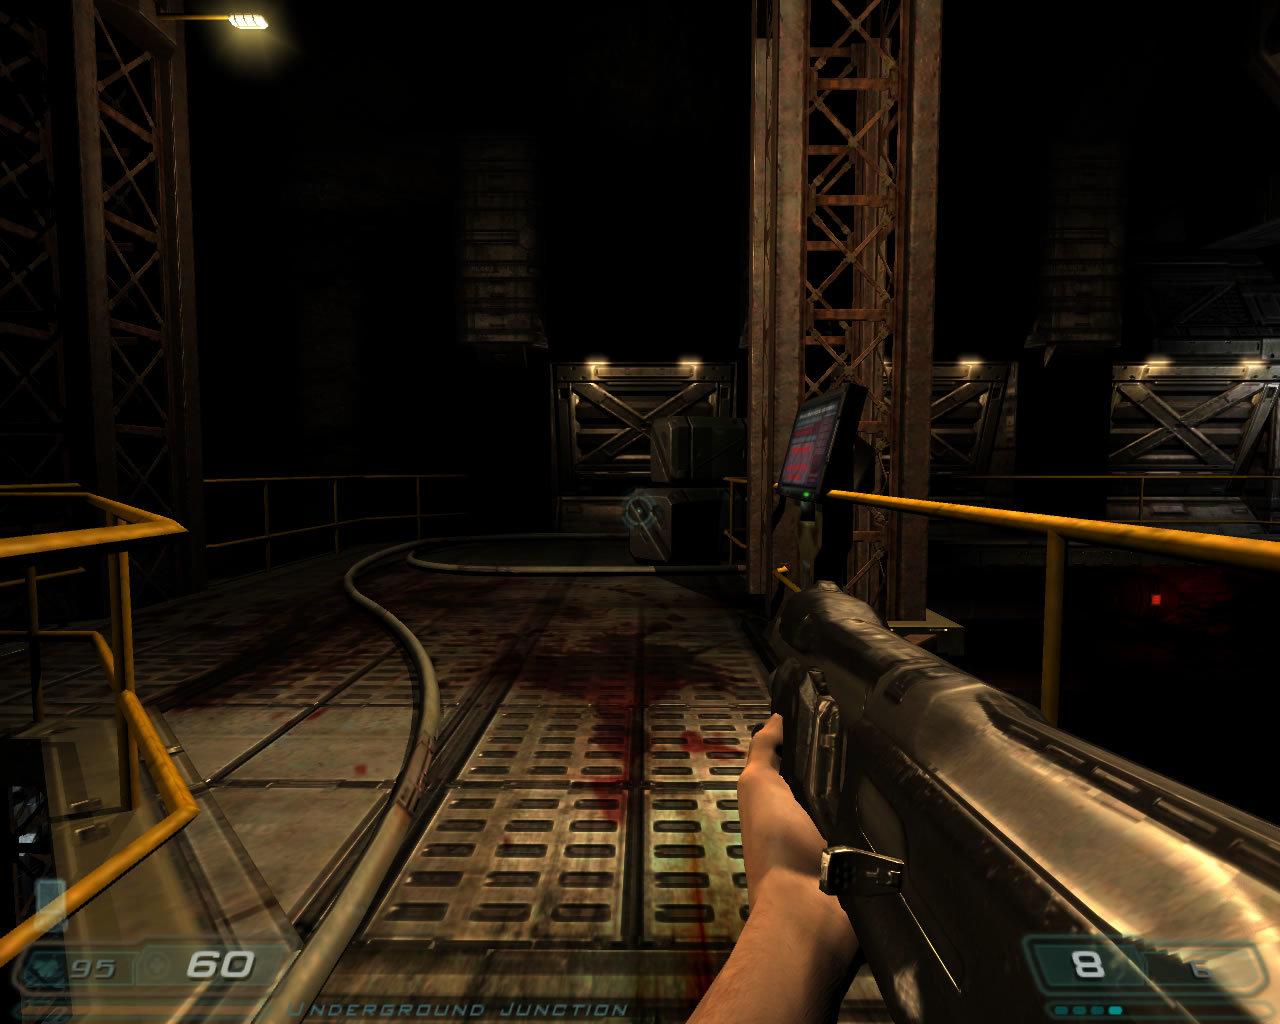 Doom 3 Medium Quality w/ 2x AA